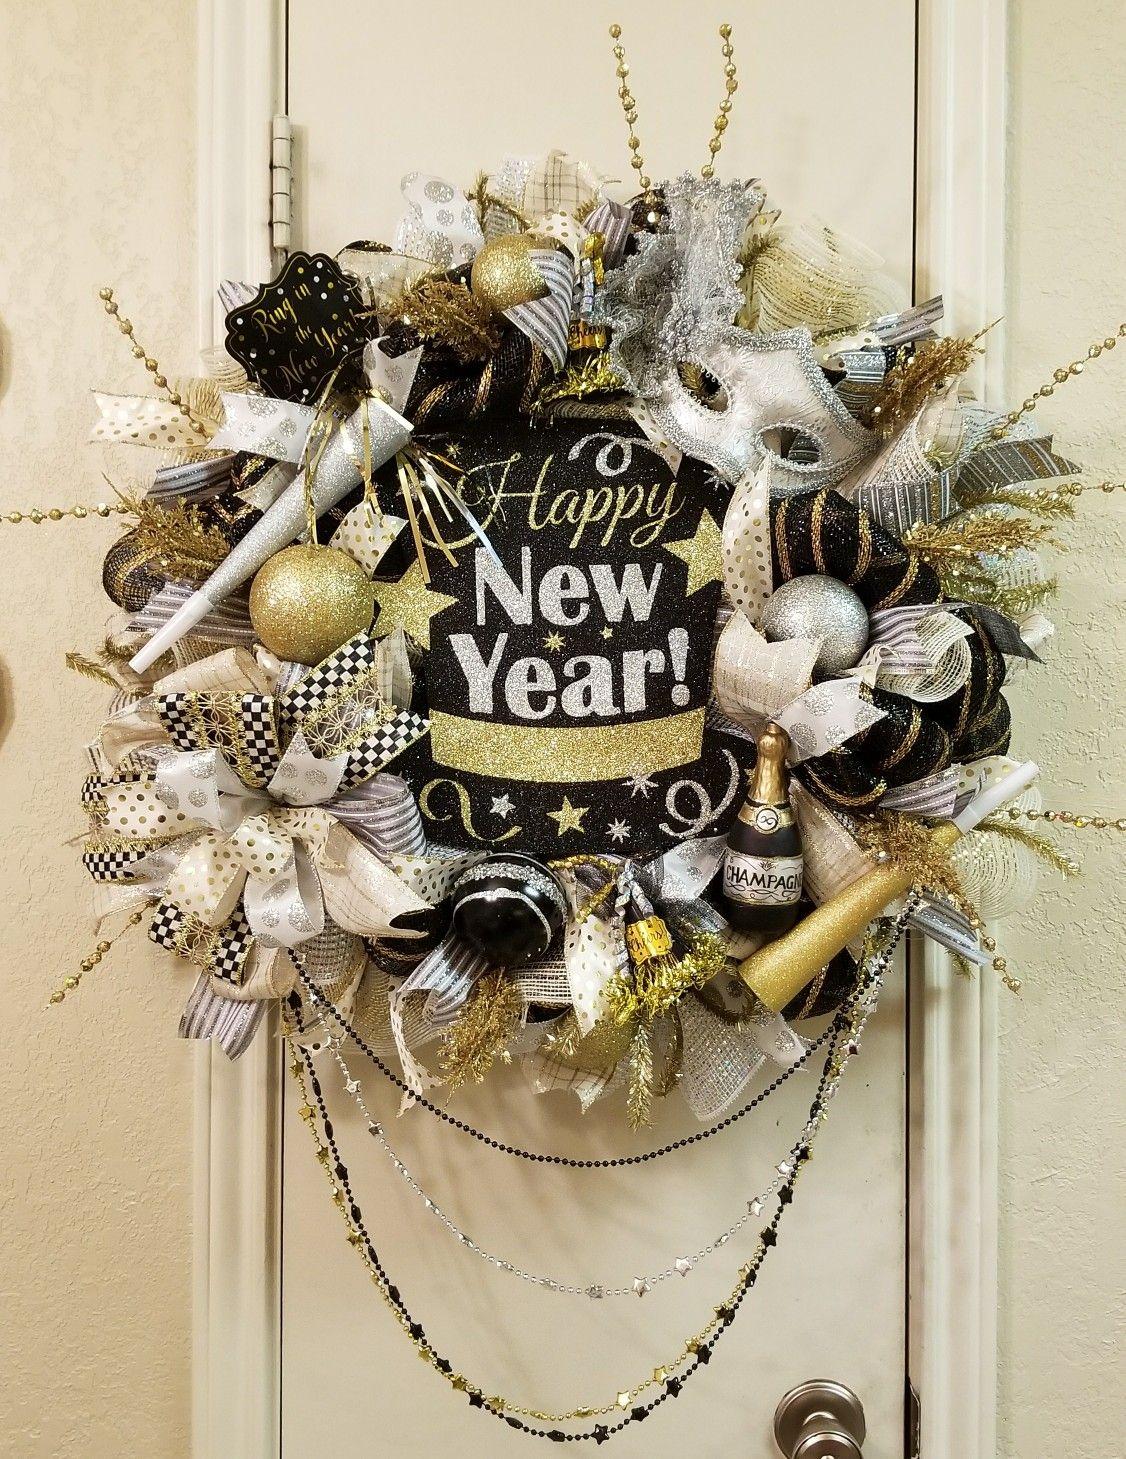 Happy New Year Deco Mesh Wreath | Winter decorations diy ...